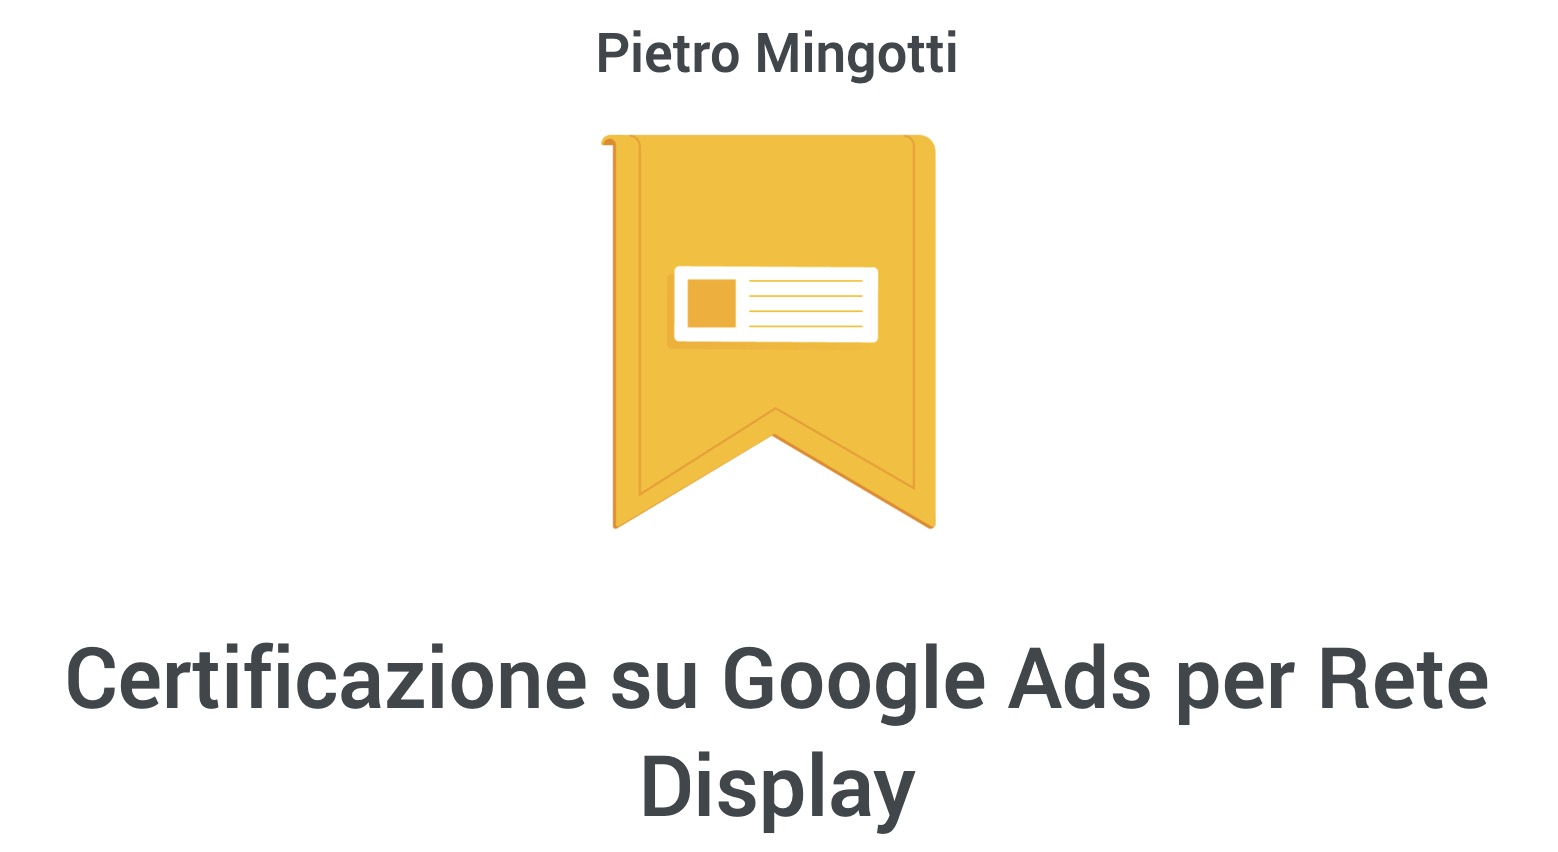 Pietro Mingotti Certificazioni Display